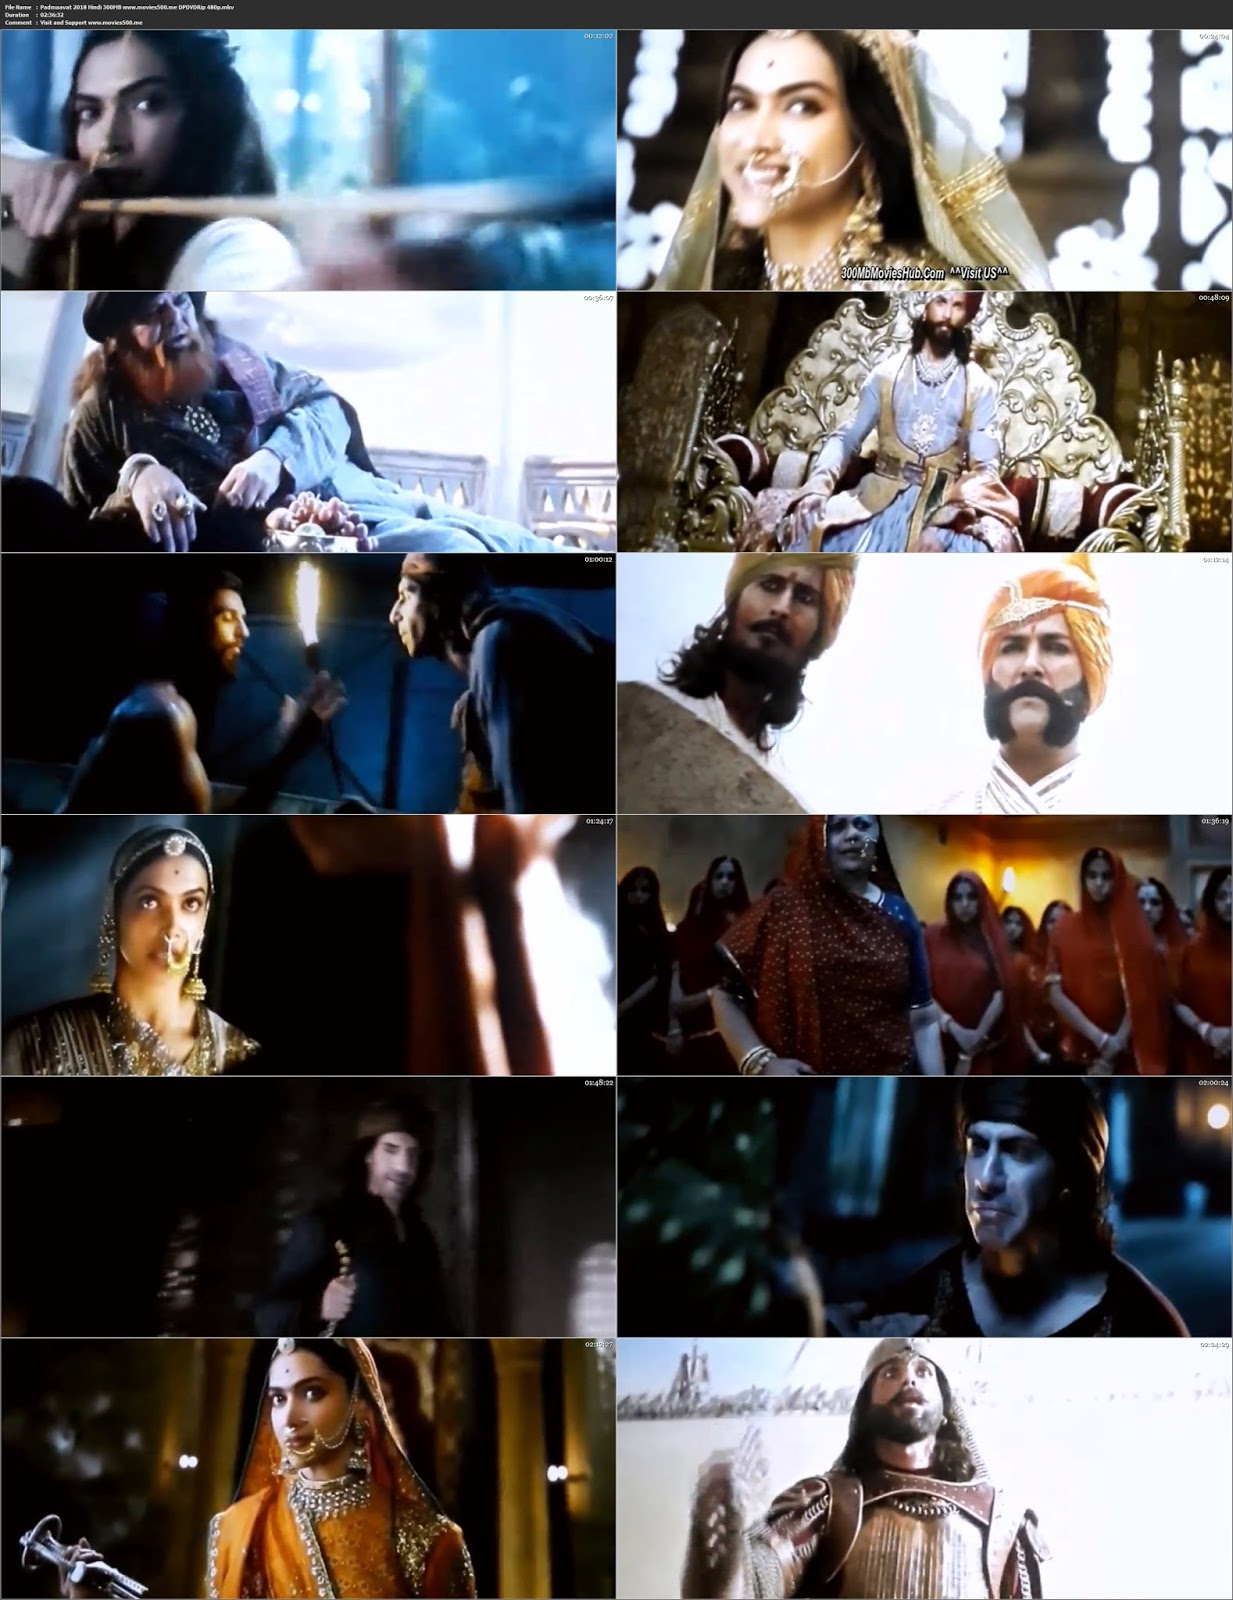 Padmaavati 2018 Bollywood 300MB Full Movie PDVDRip 480p at xn--o9jyb9aa09c103qnhe3m5i.com